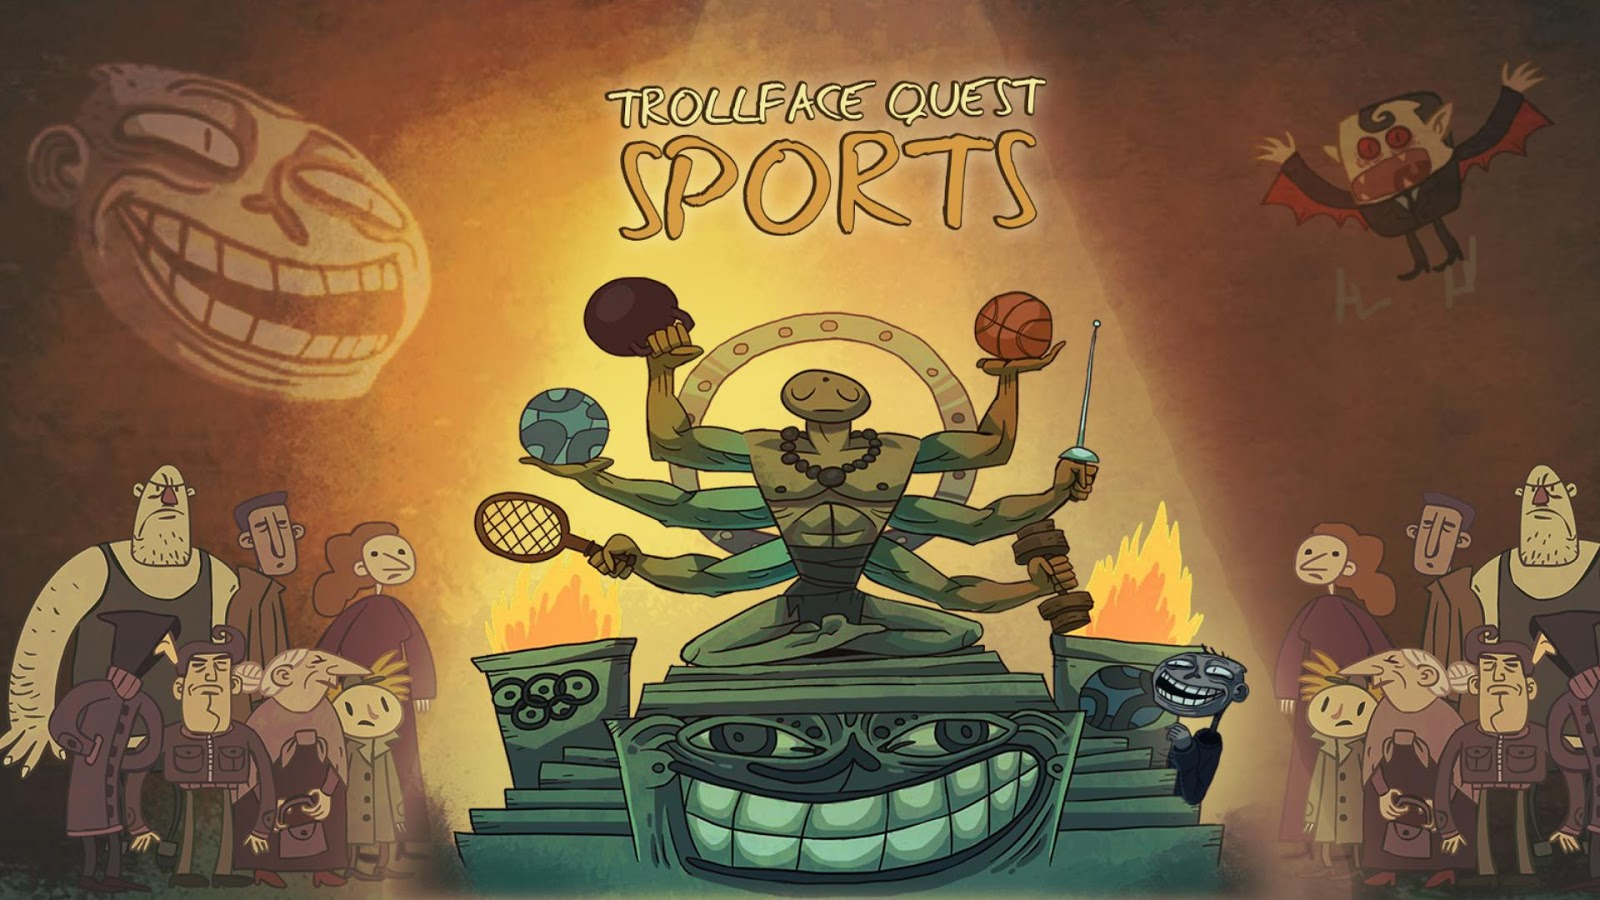 Troll face quest sports puzzle aplicaciones de android en google